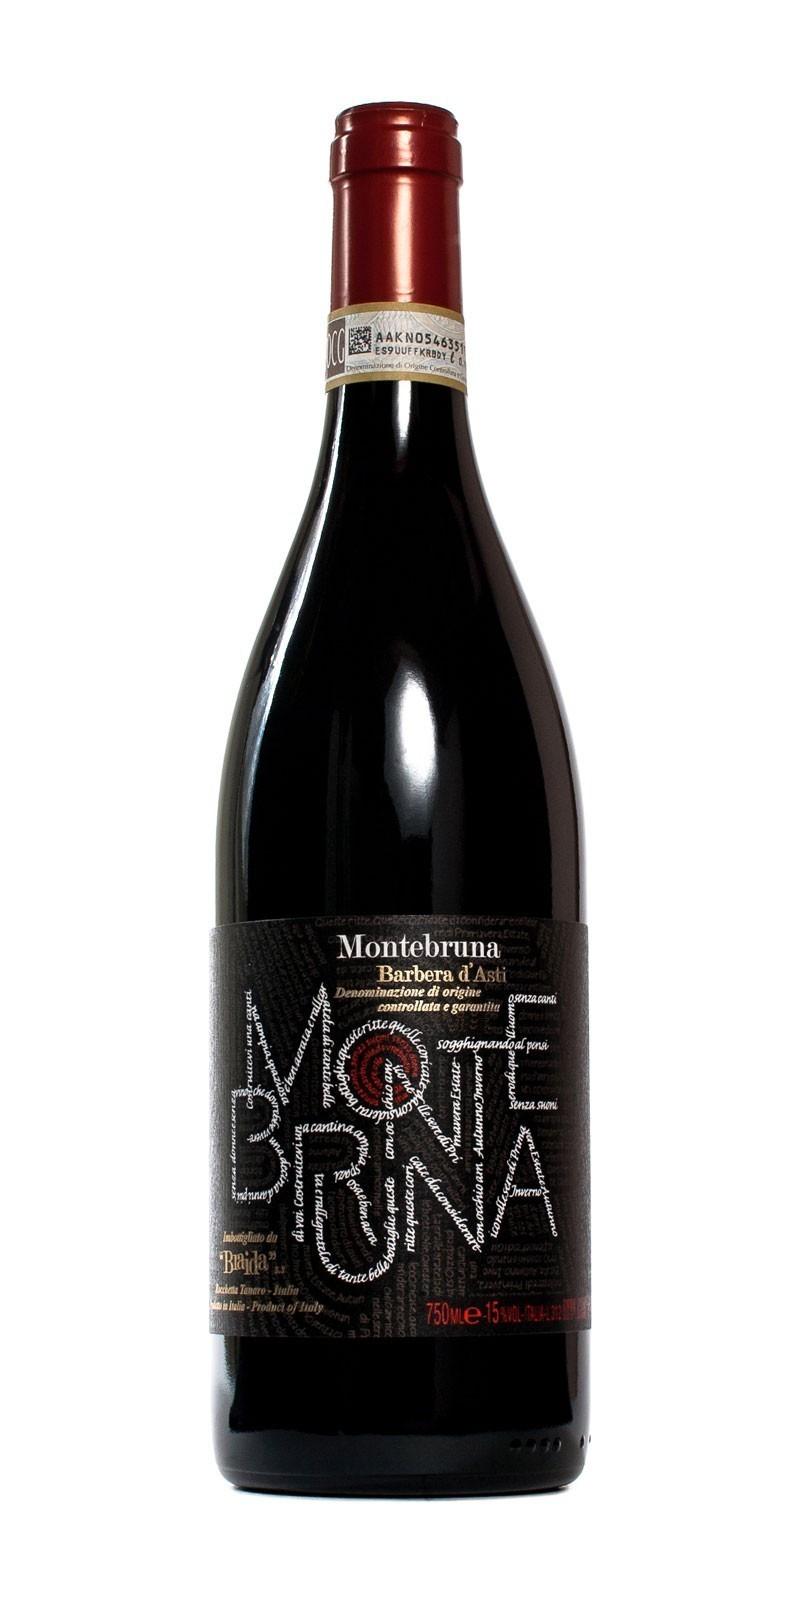 Barbera d'Asti Montebruna (2013) Braida